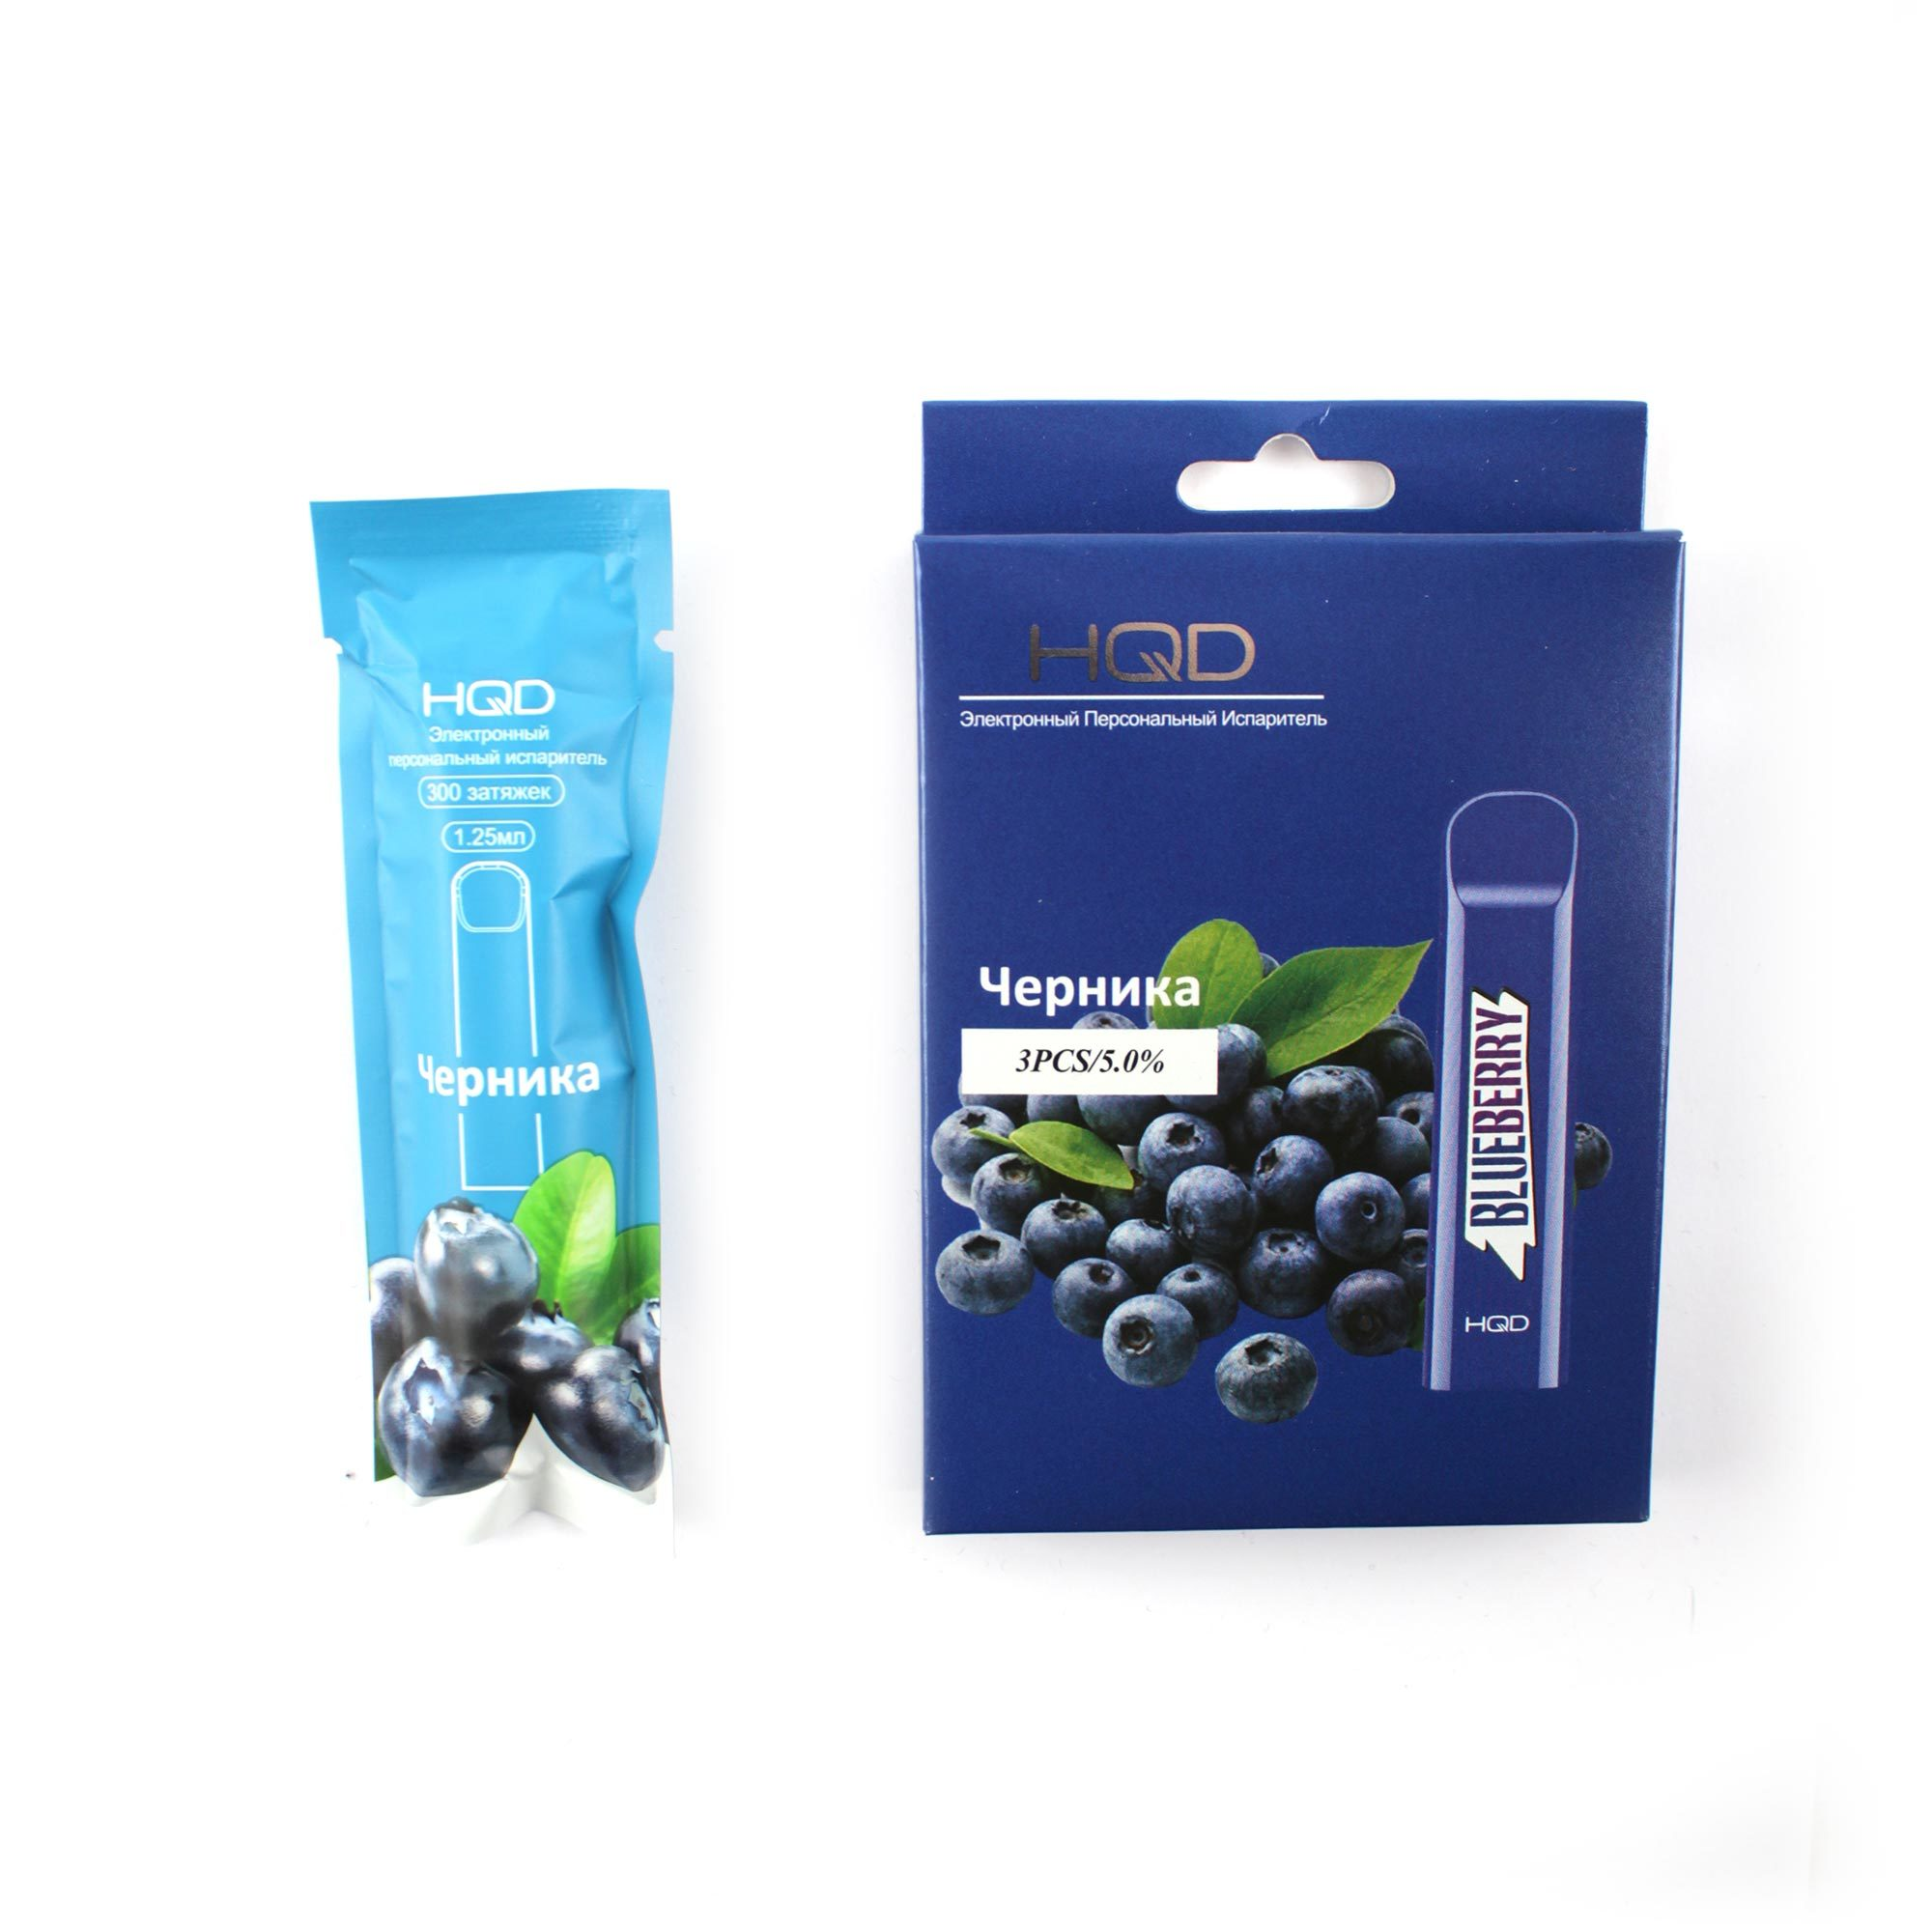 Одноразовая электронная сигарета HQD Blueberry (черника)